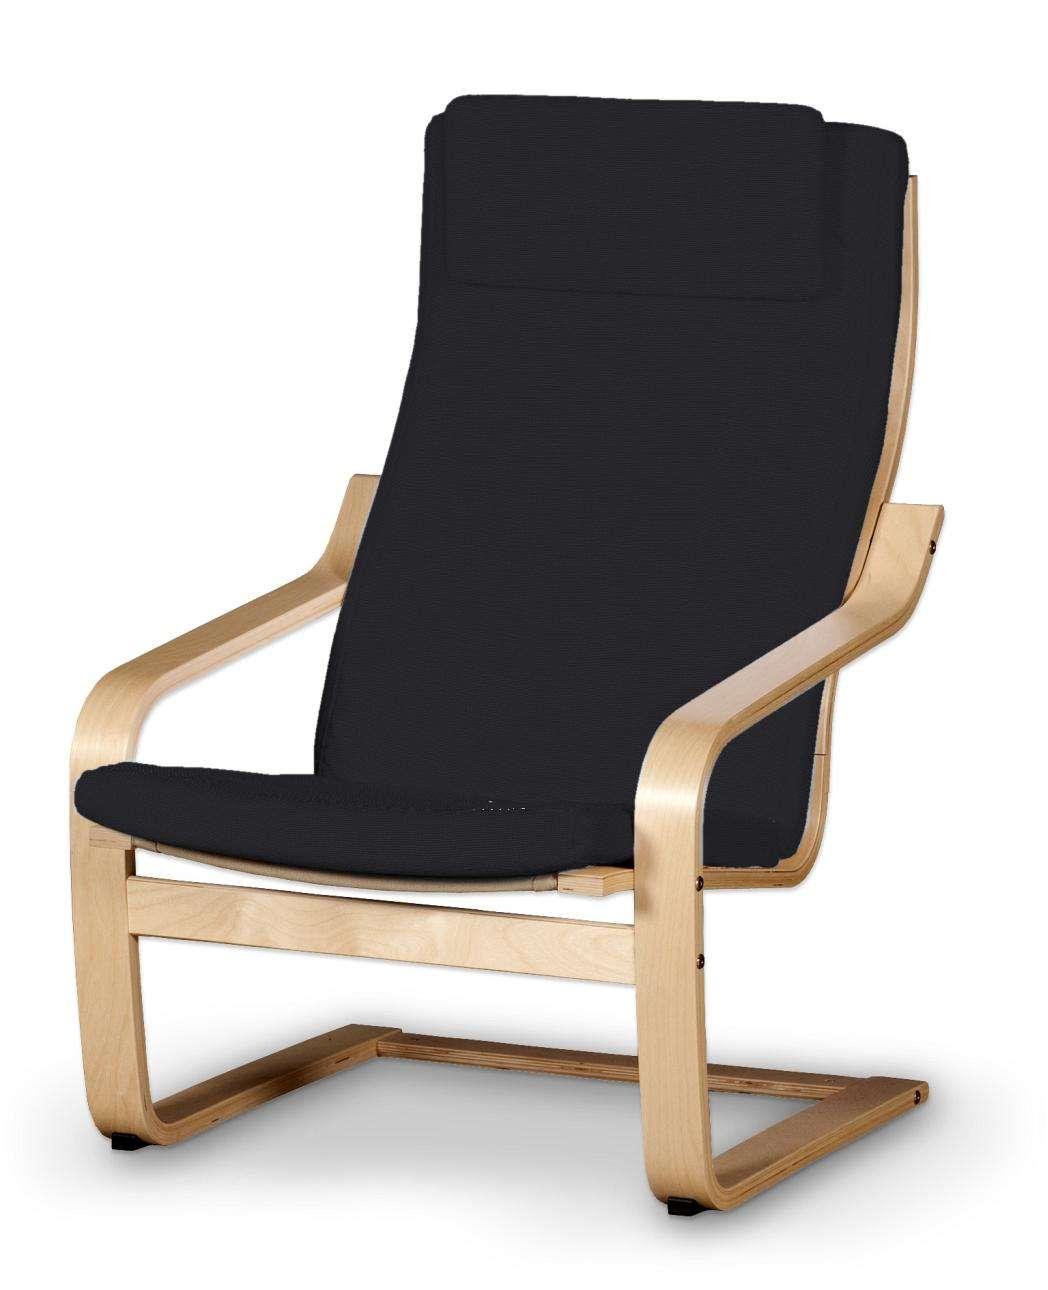 Poduszka na fotel Poäng II Fotel Poäng II w kolekcji Etna , tkanina: 705-00